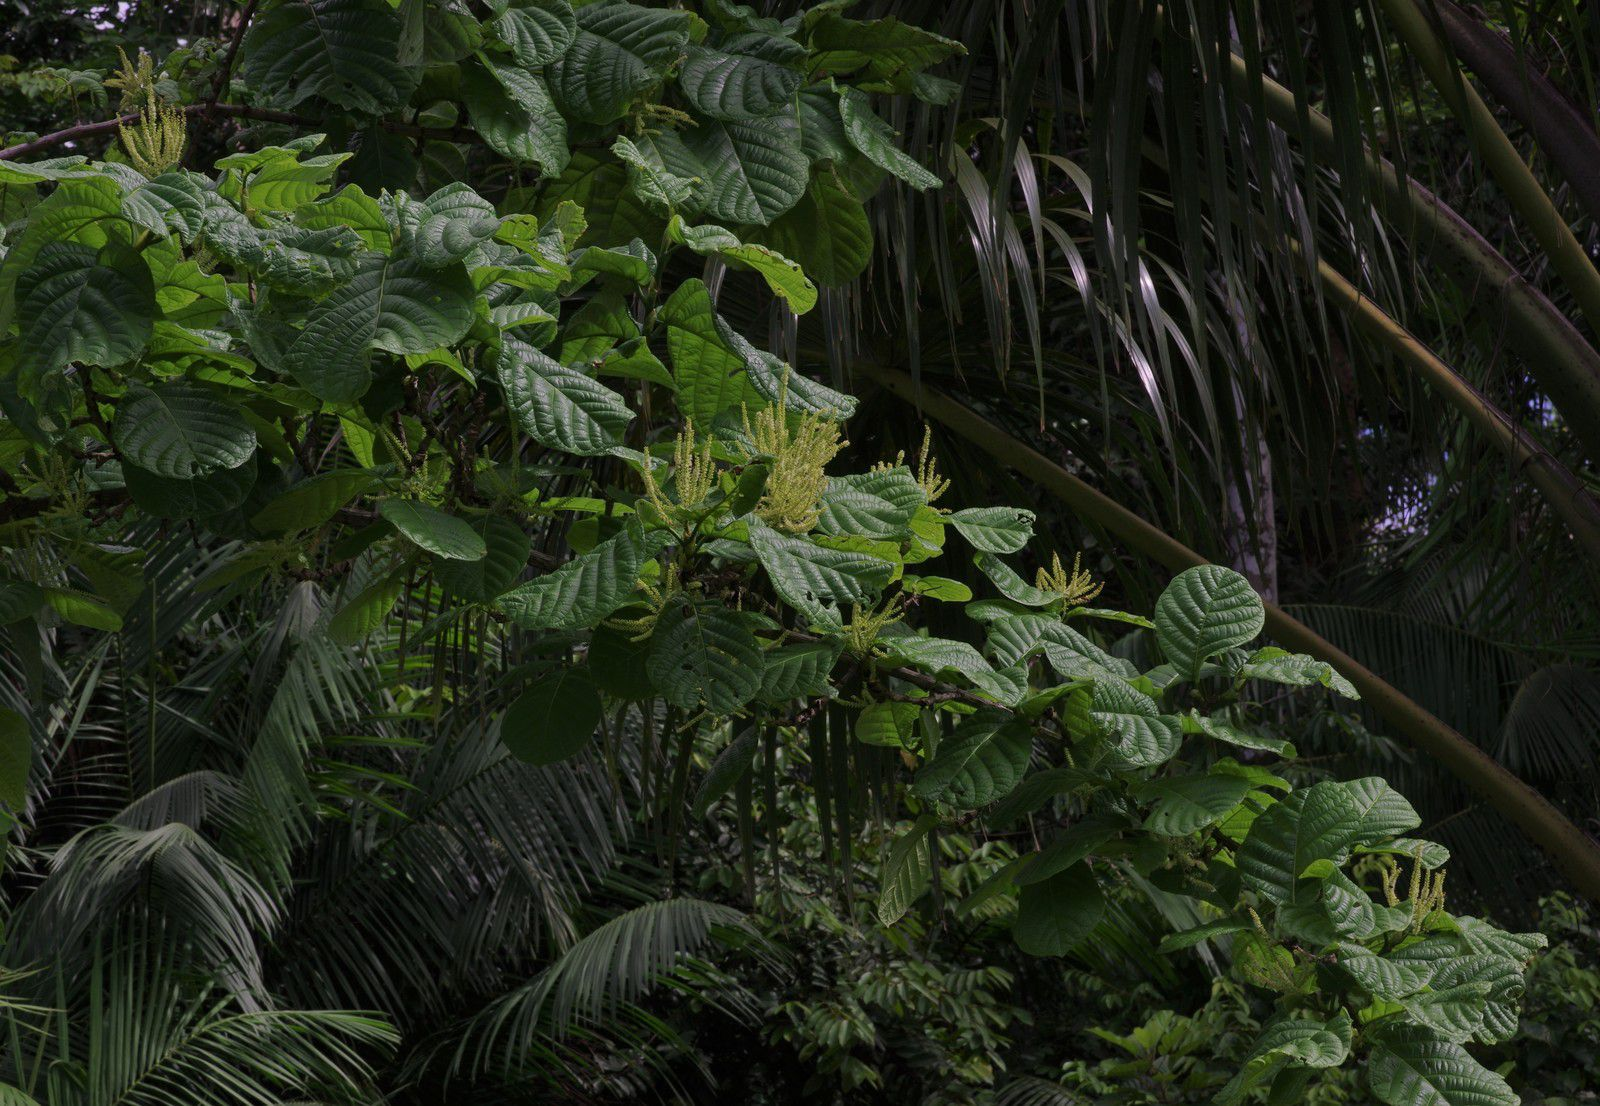 Coccoloba latifolia